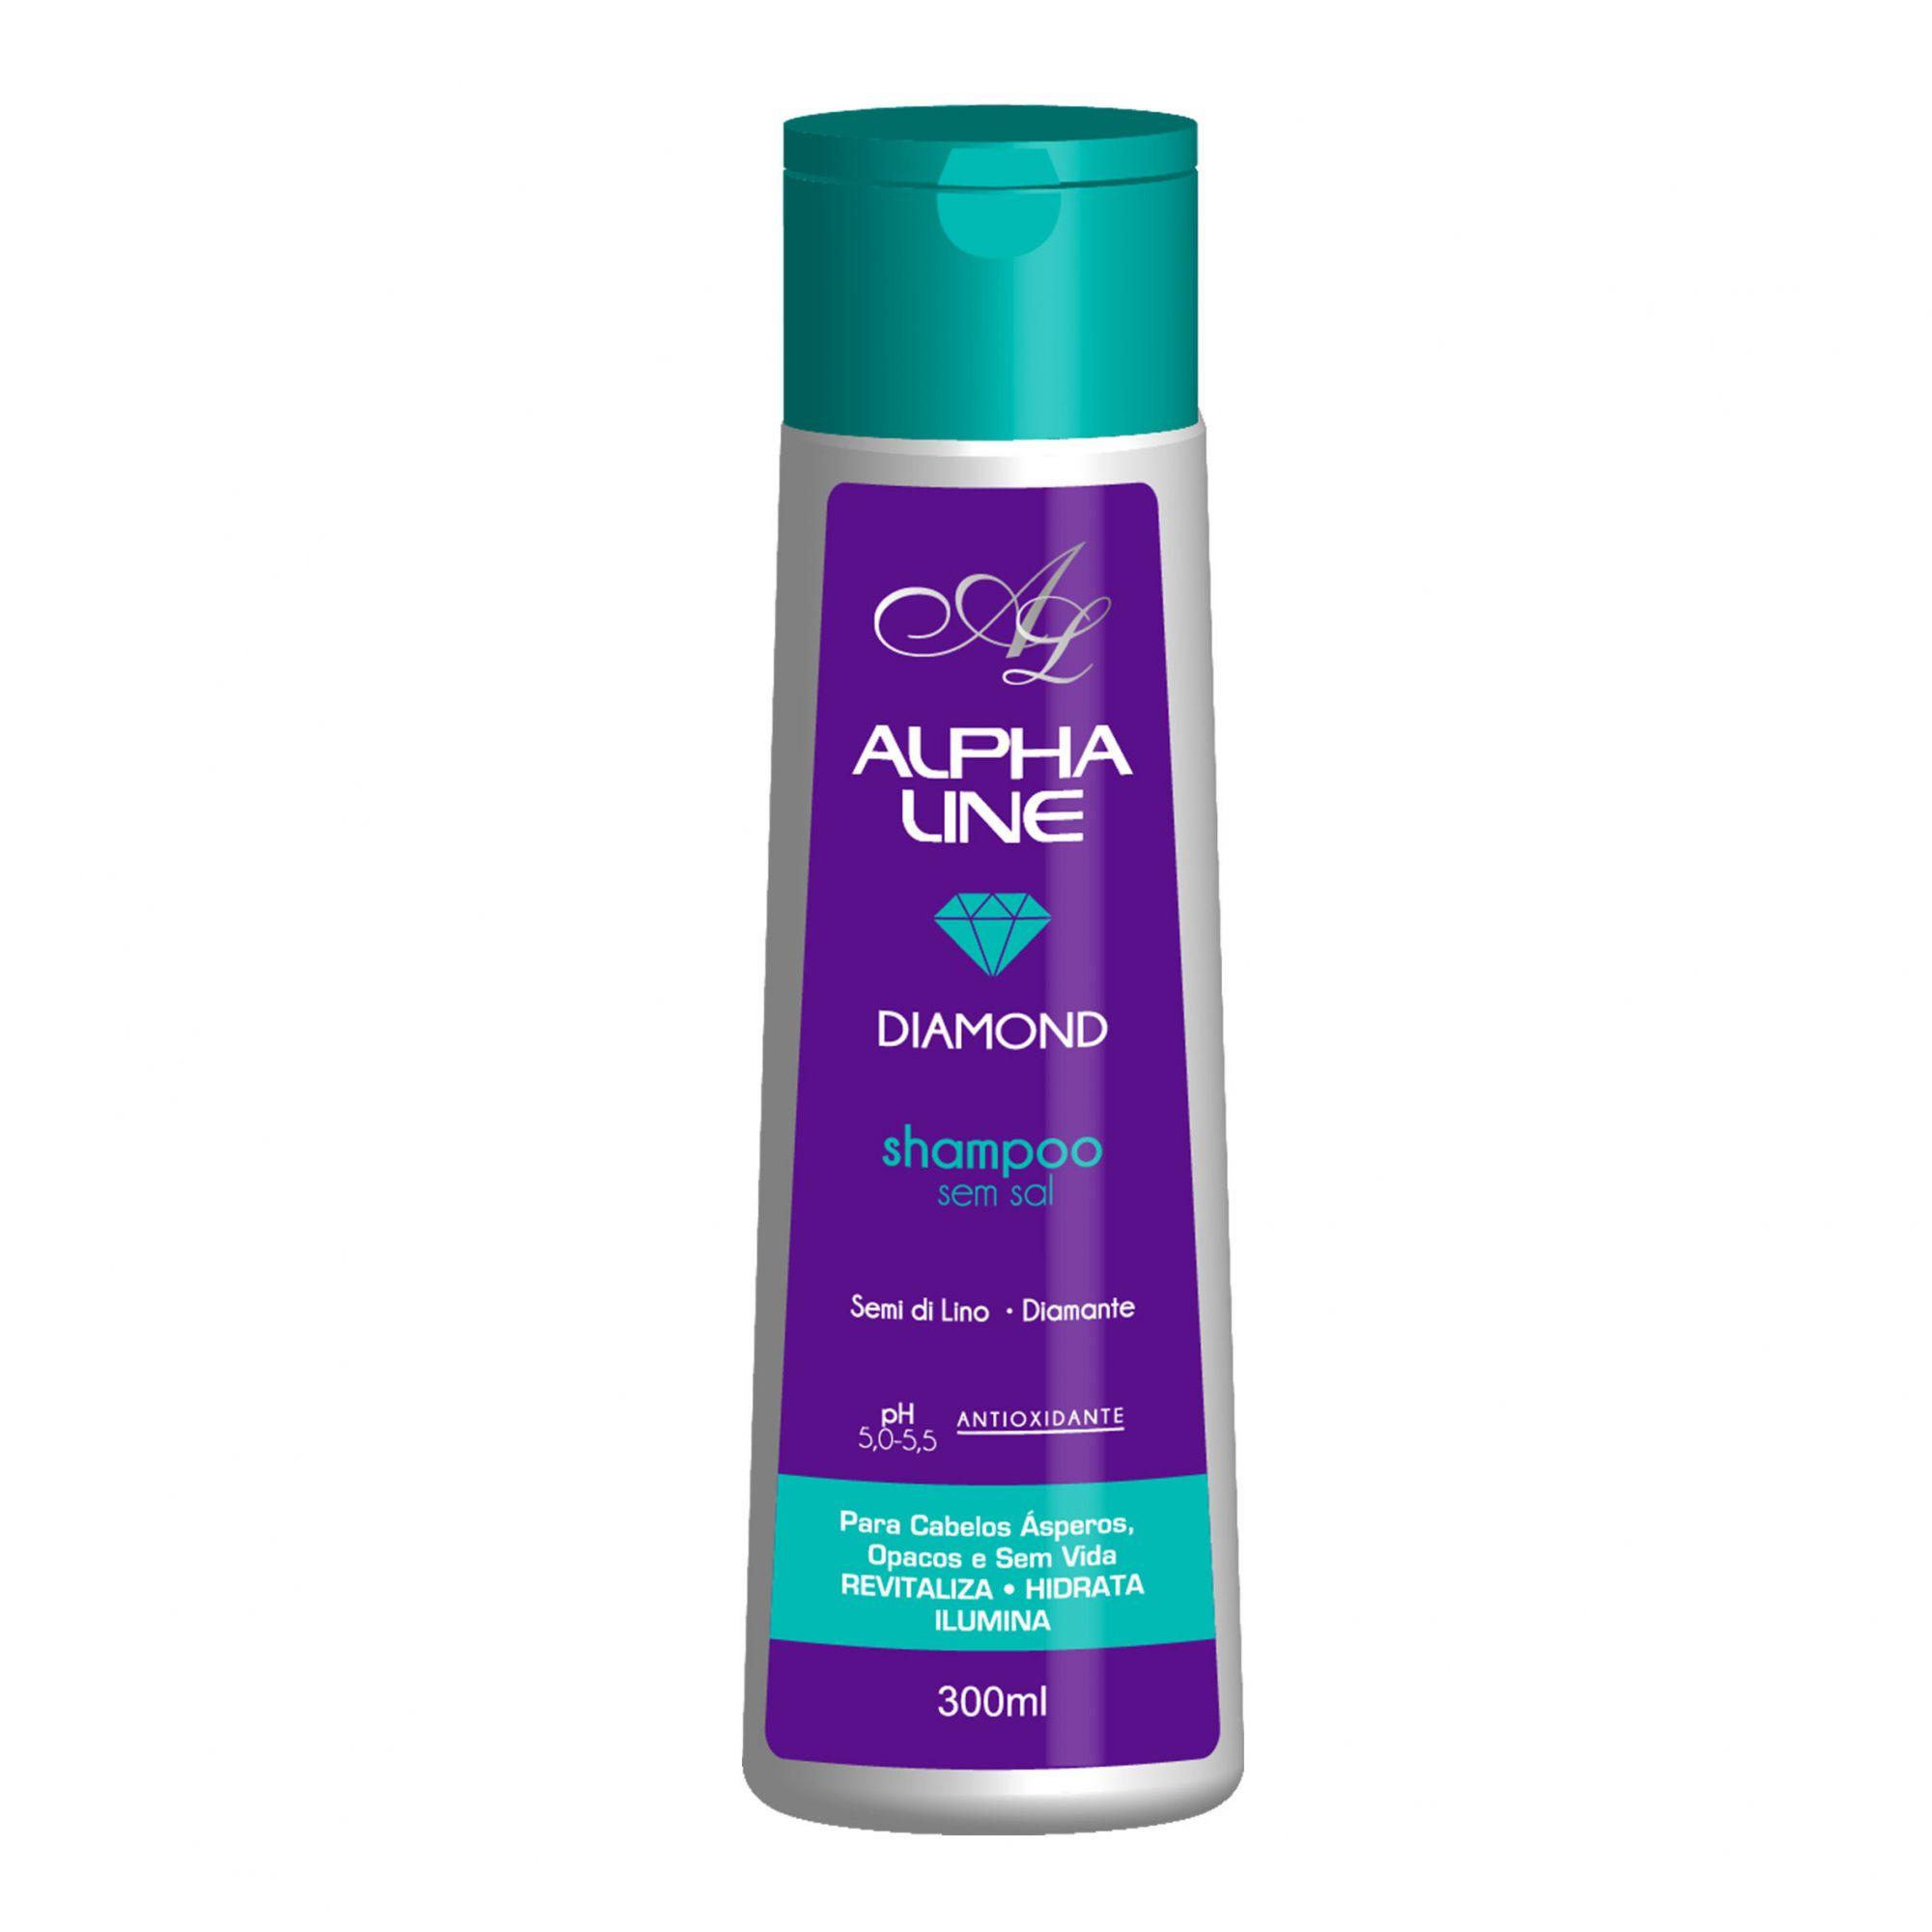 Alpha Line Shampoo Diamond  300ml.